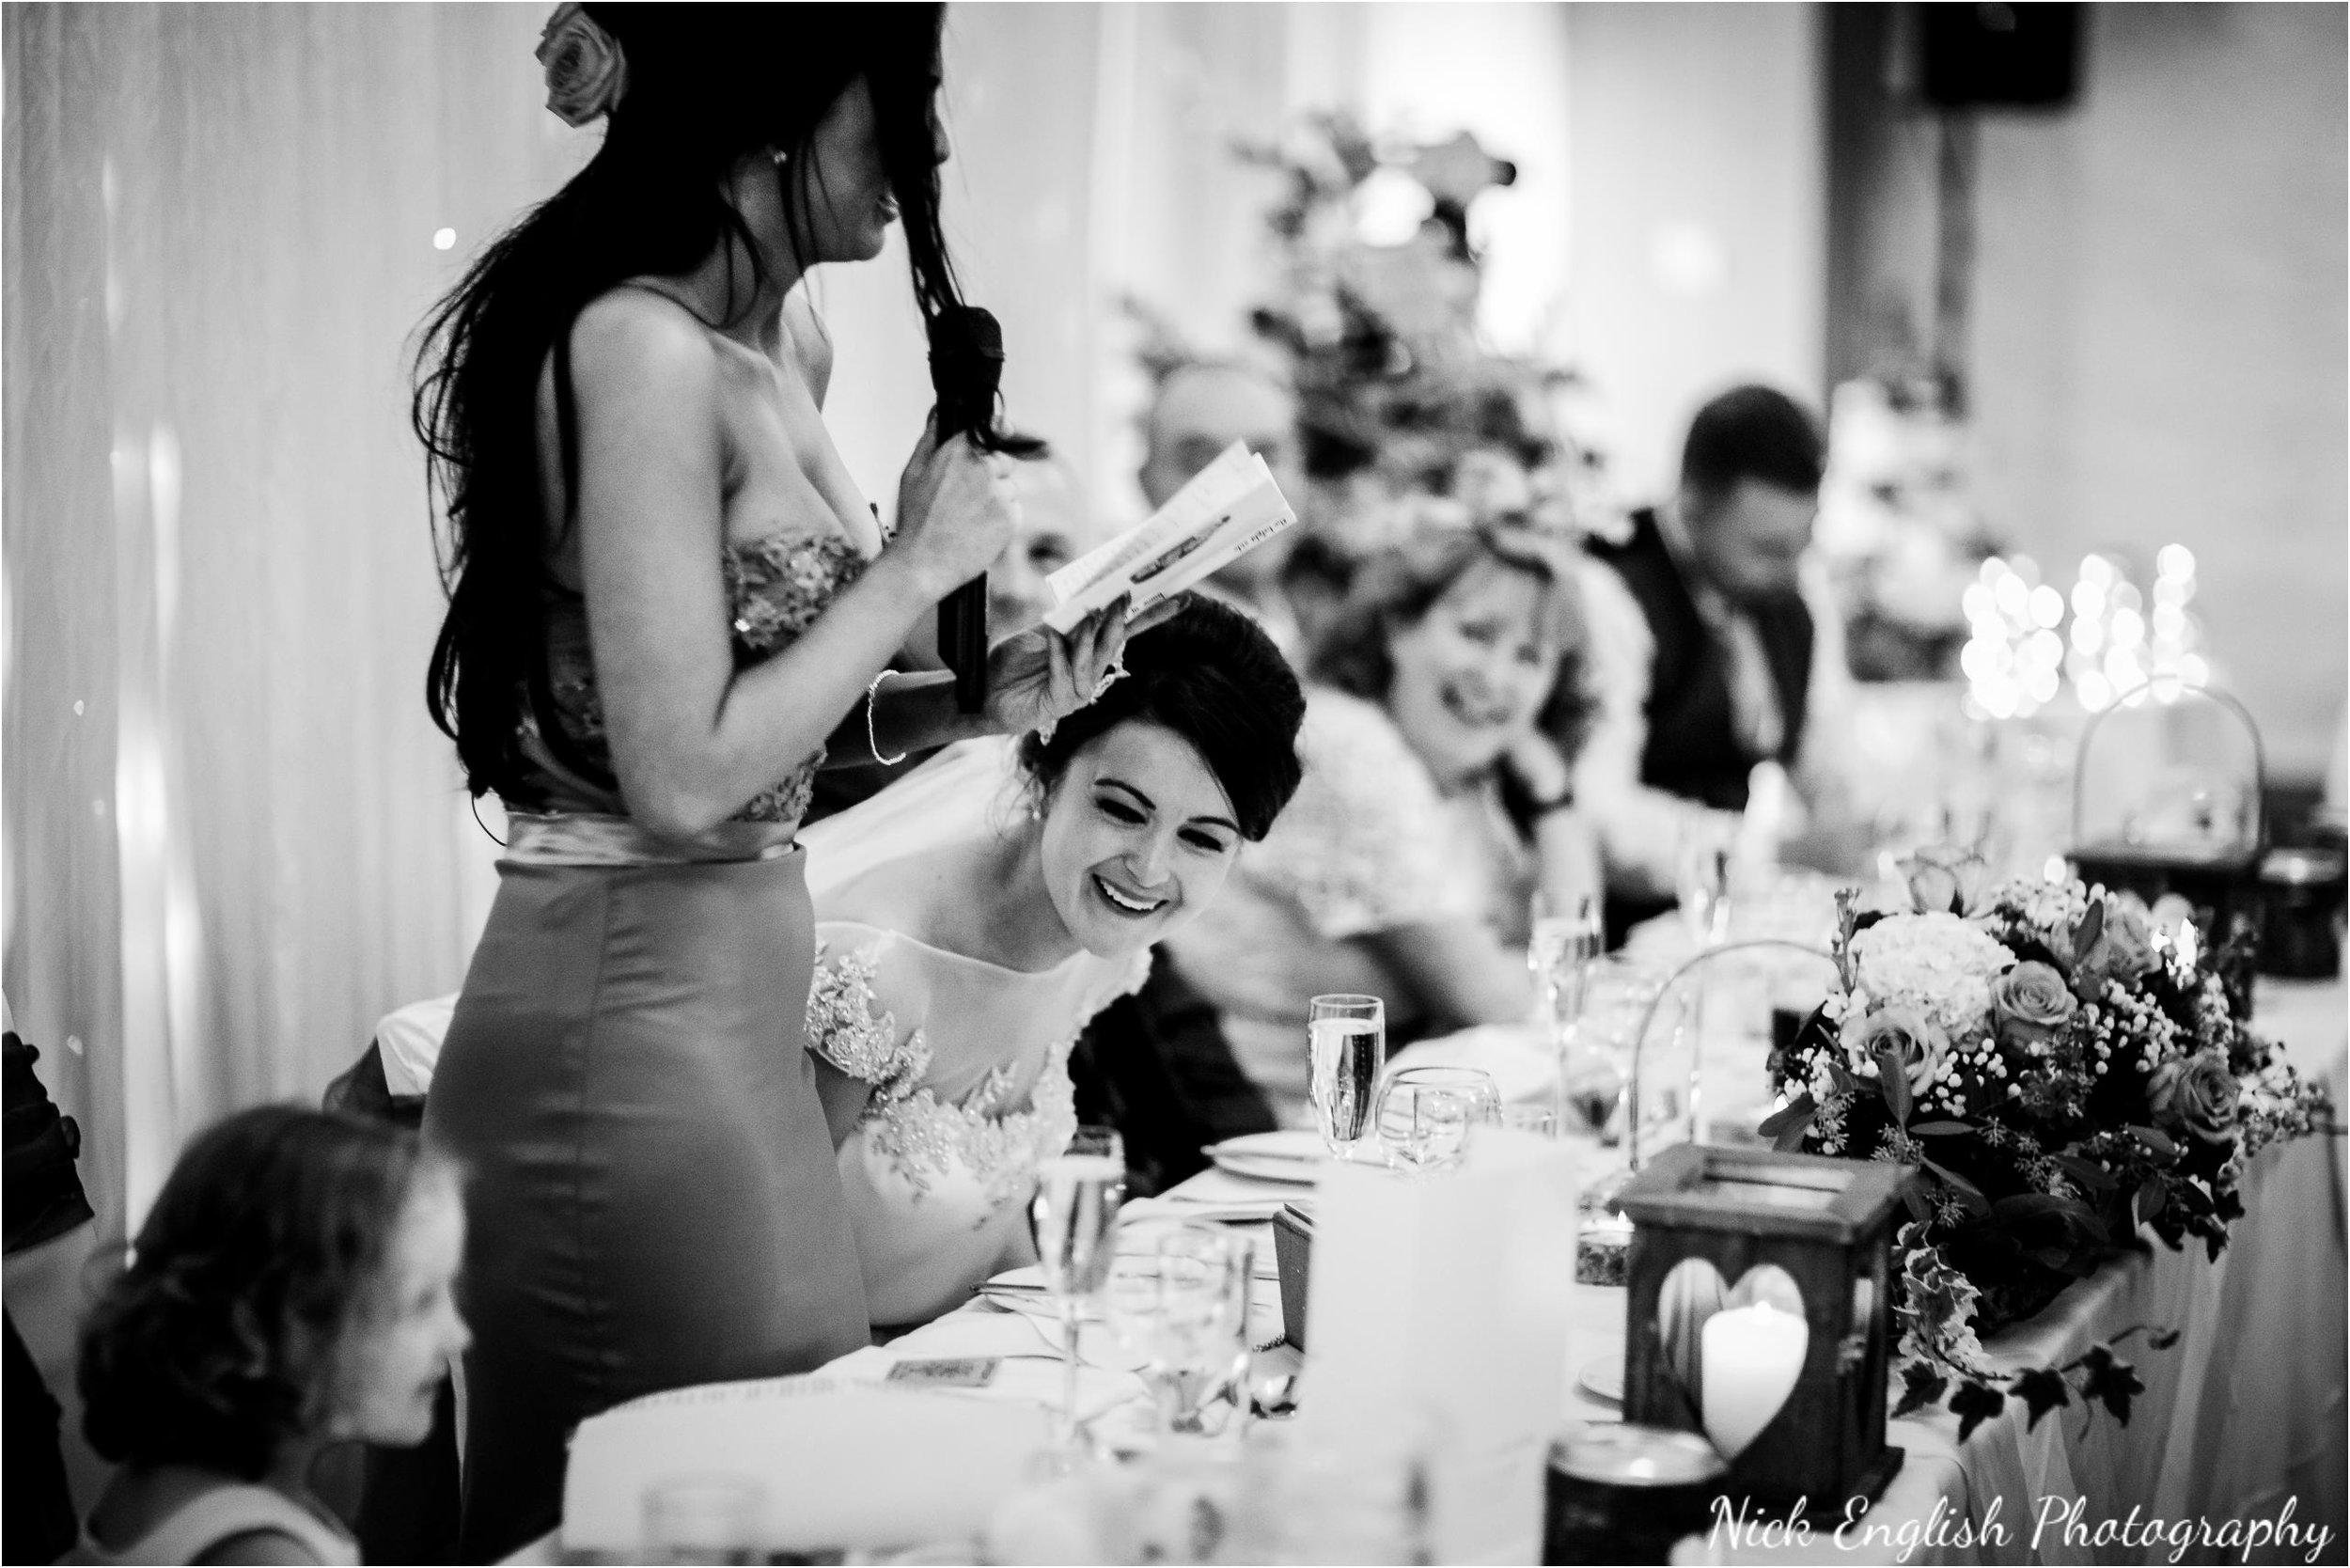 Stacey-Ash-Wedding-Photographs-Stanley-House-Preston-Lancashire-150.jpg